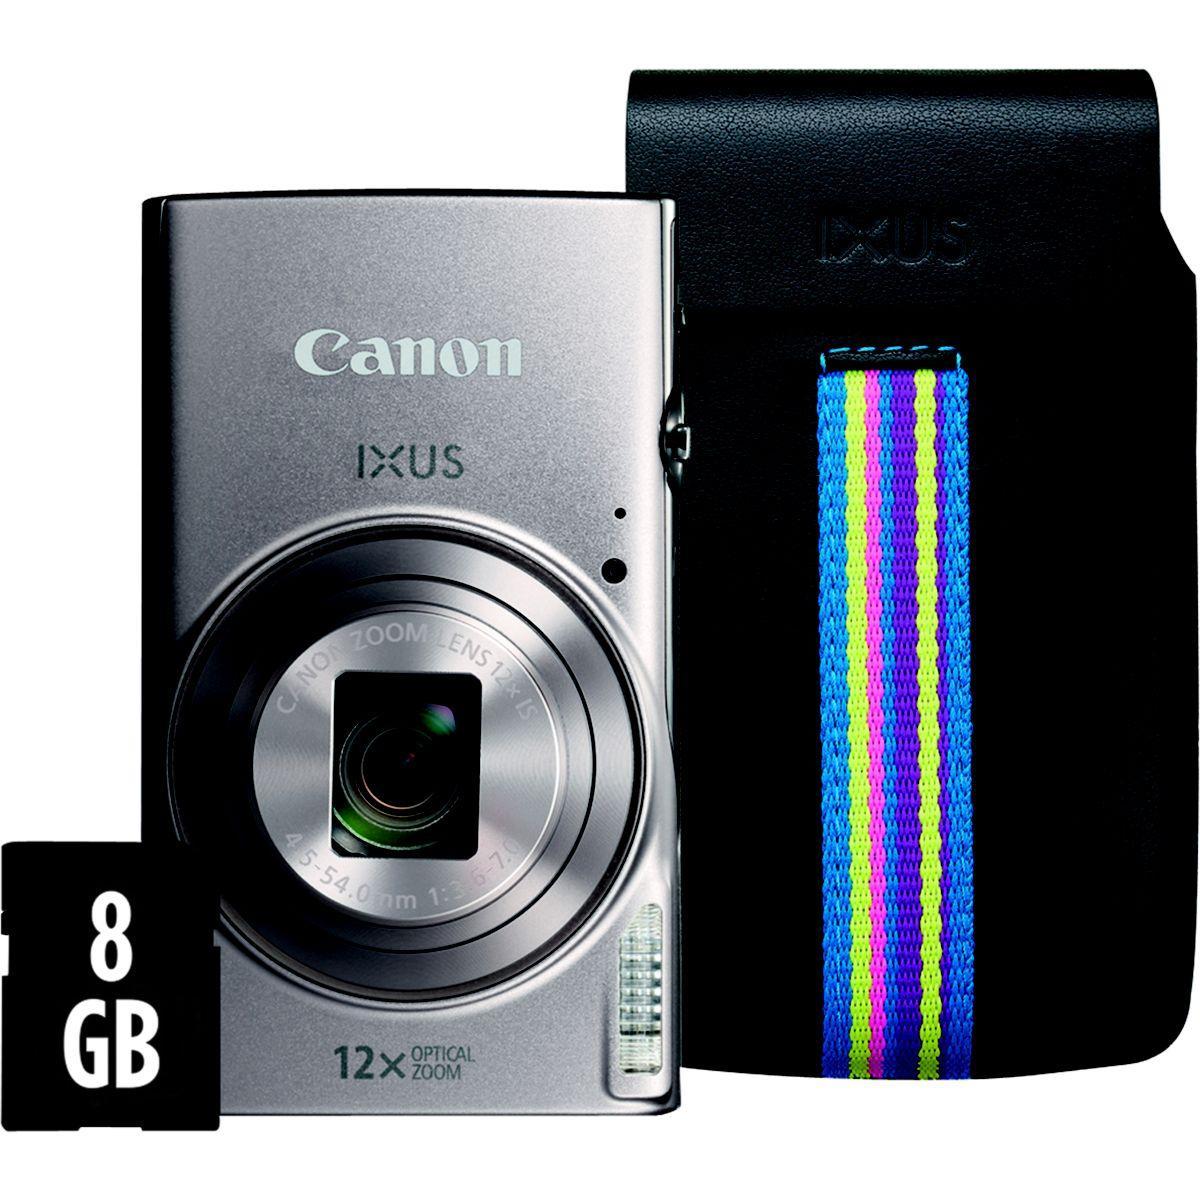 Appareil photo compact canon ixus 285 hs silver + etui + sd 8go - livraison offerte : code livphoto (photo)